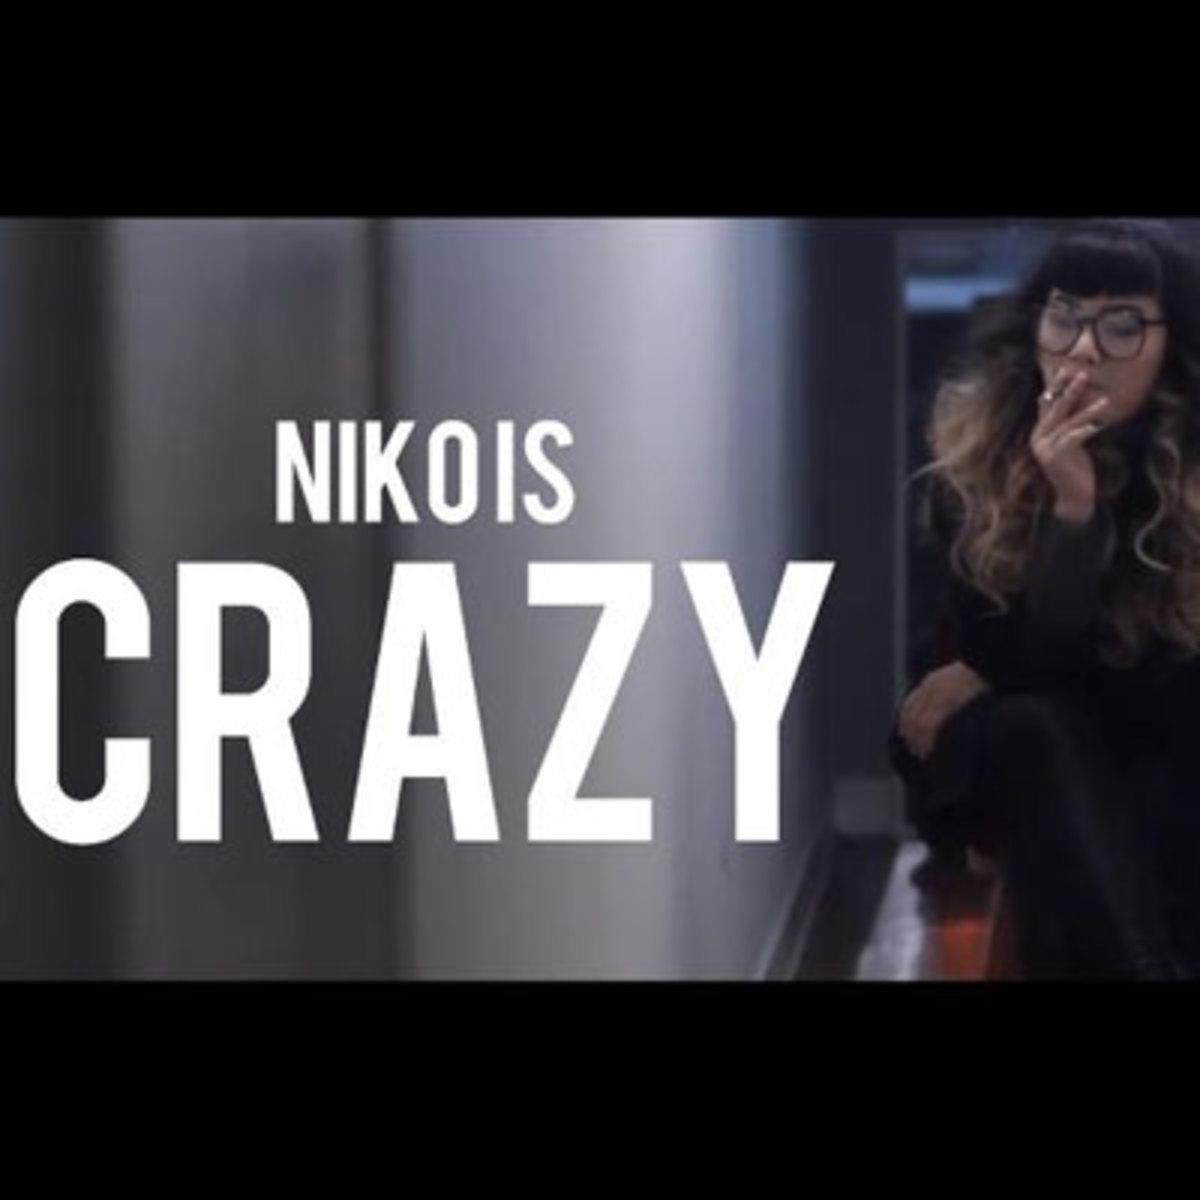 nikois-crazy.jpg